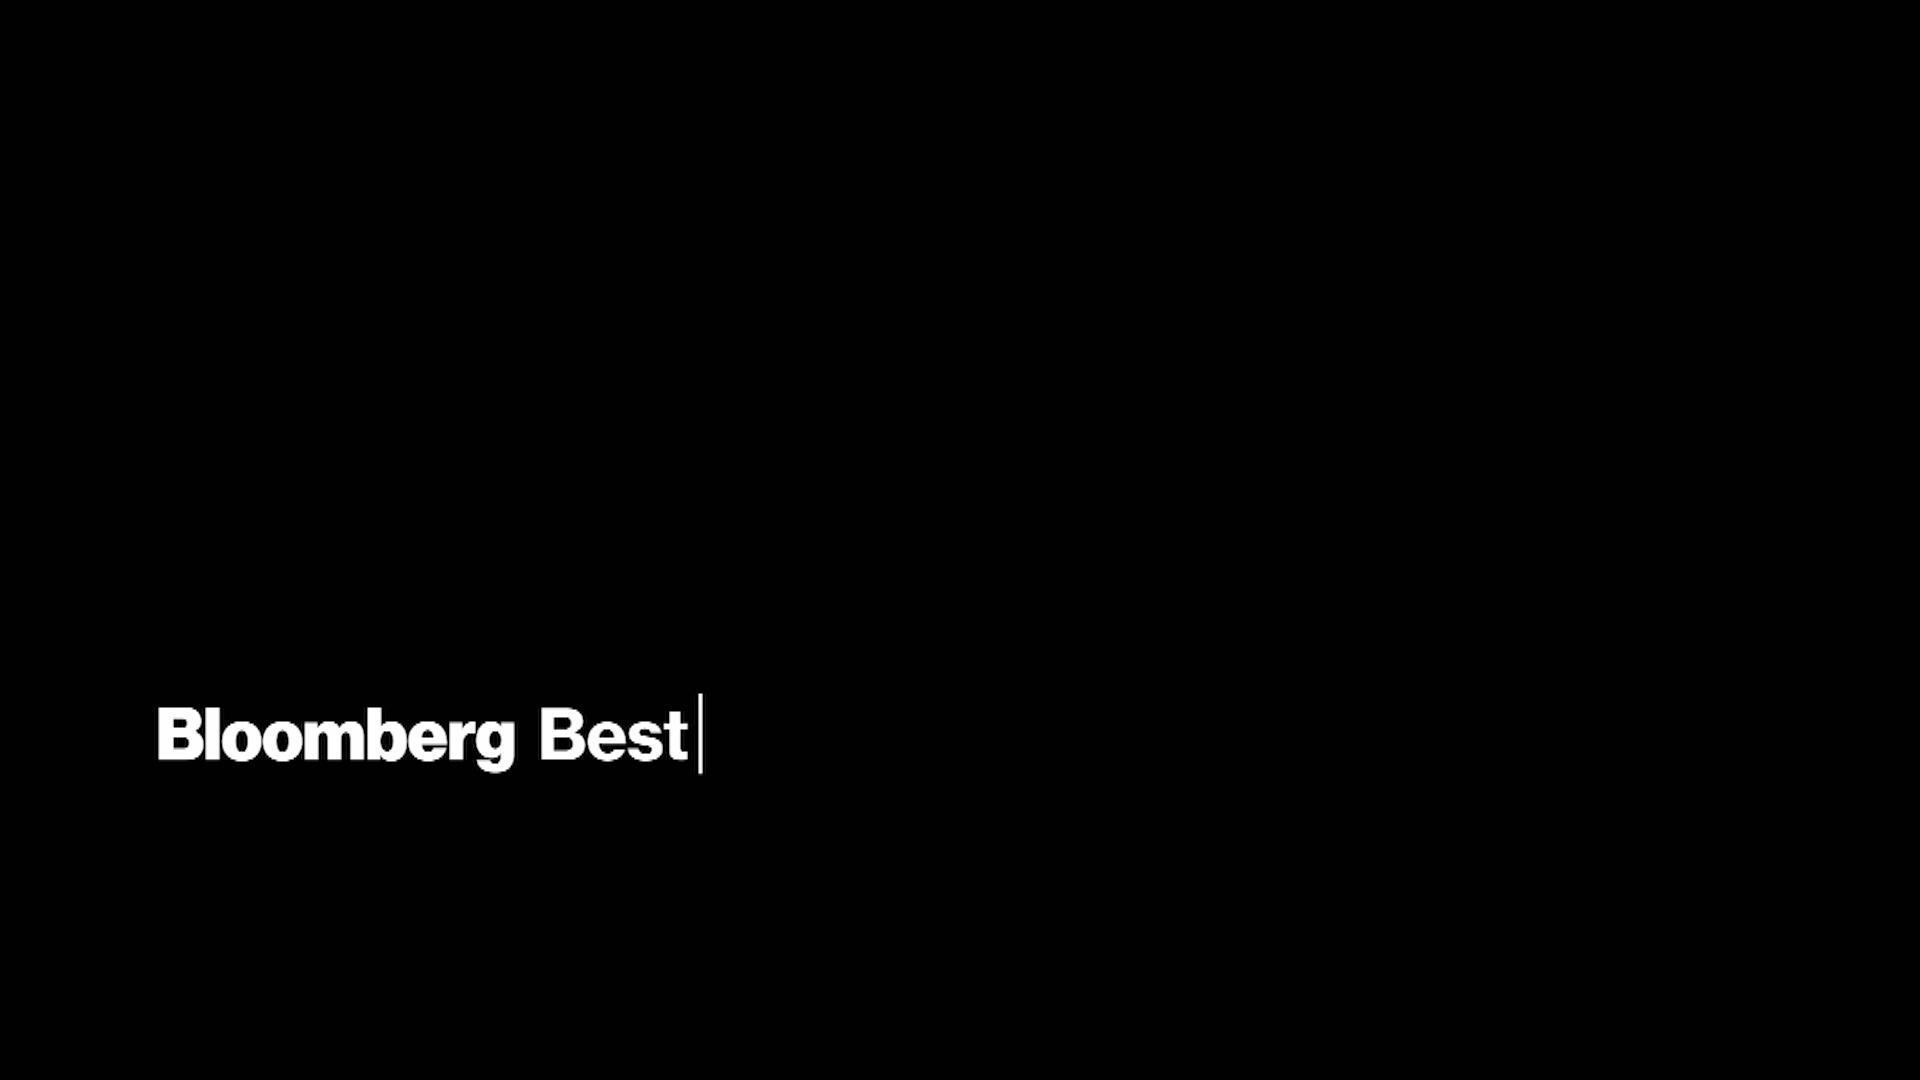 sale retailer dfa4f 5827f 'Bloomberg Best' Full Show (04/19/2019) – Bloomberg